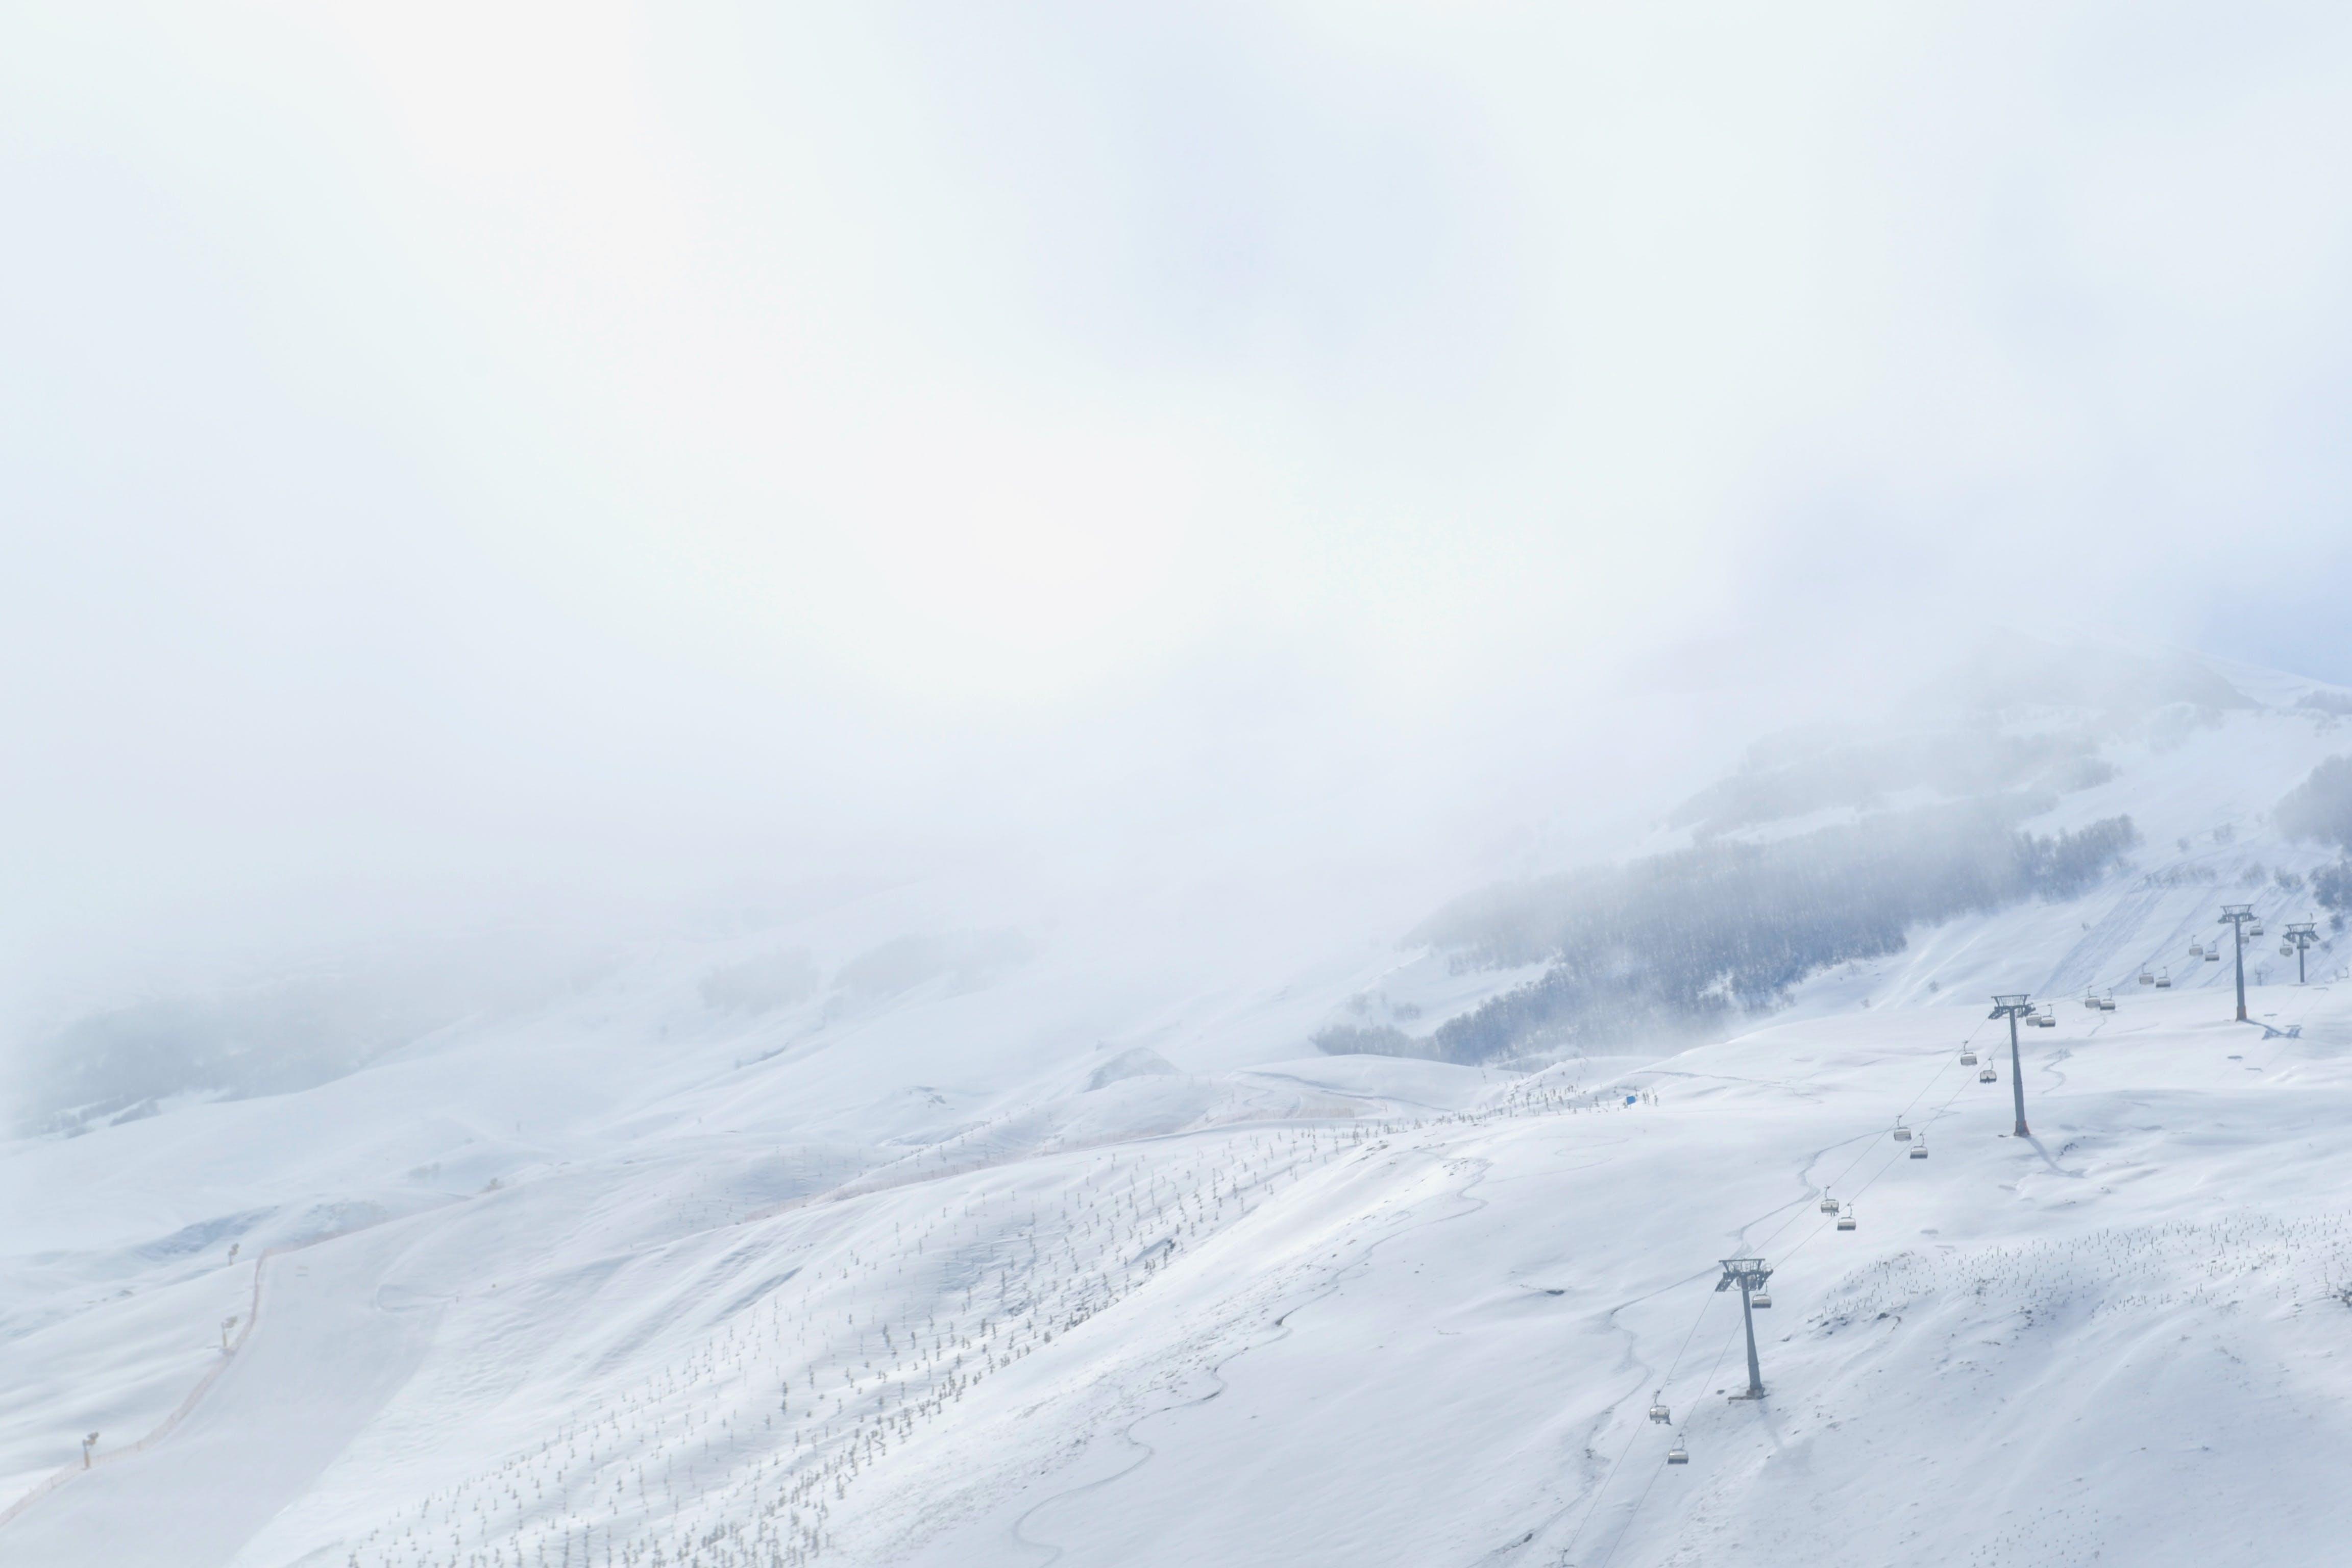 Free stock photo of winter, whitespace, white, ski lift